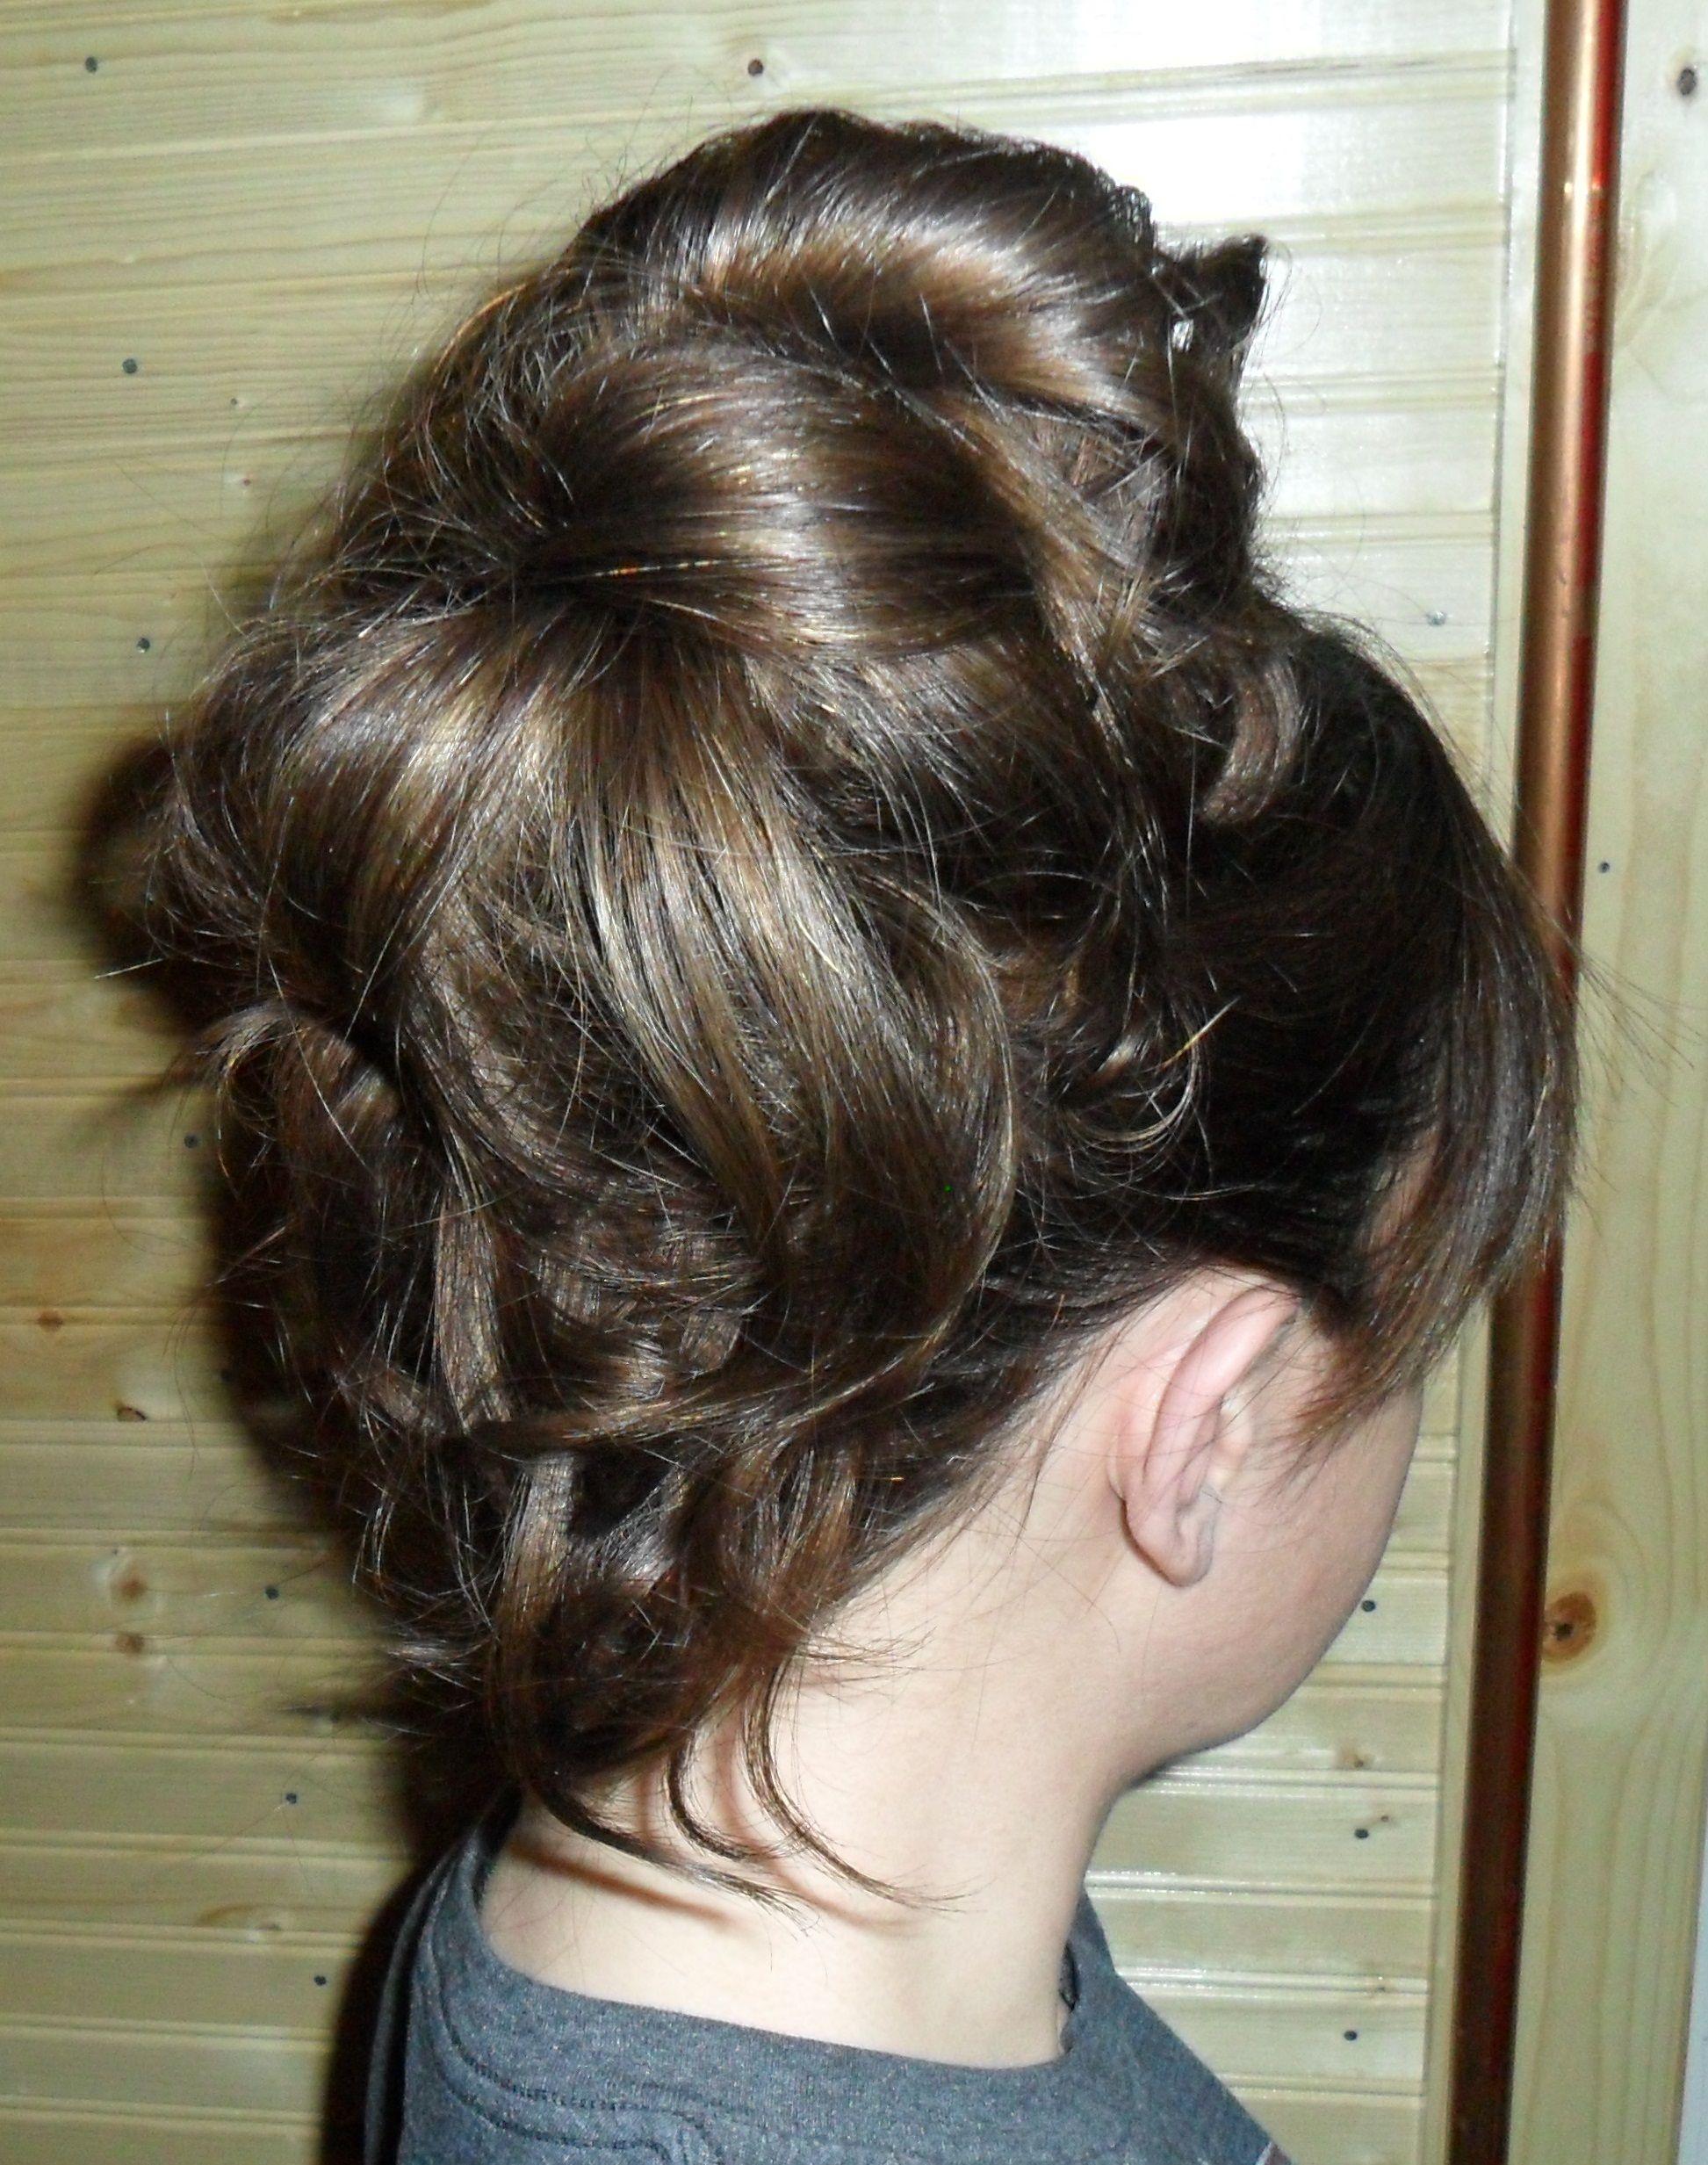 Updo hairstyle. Half bun/half ponytail curly hybrid. BZenBeauty | Рапунцель